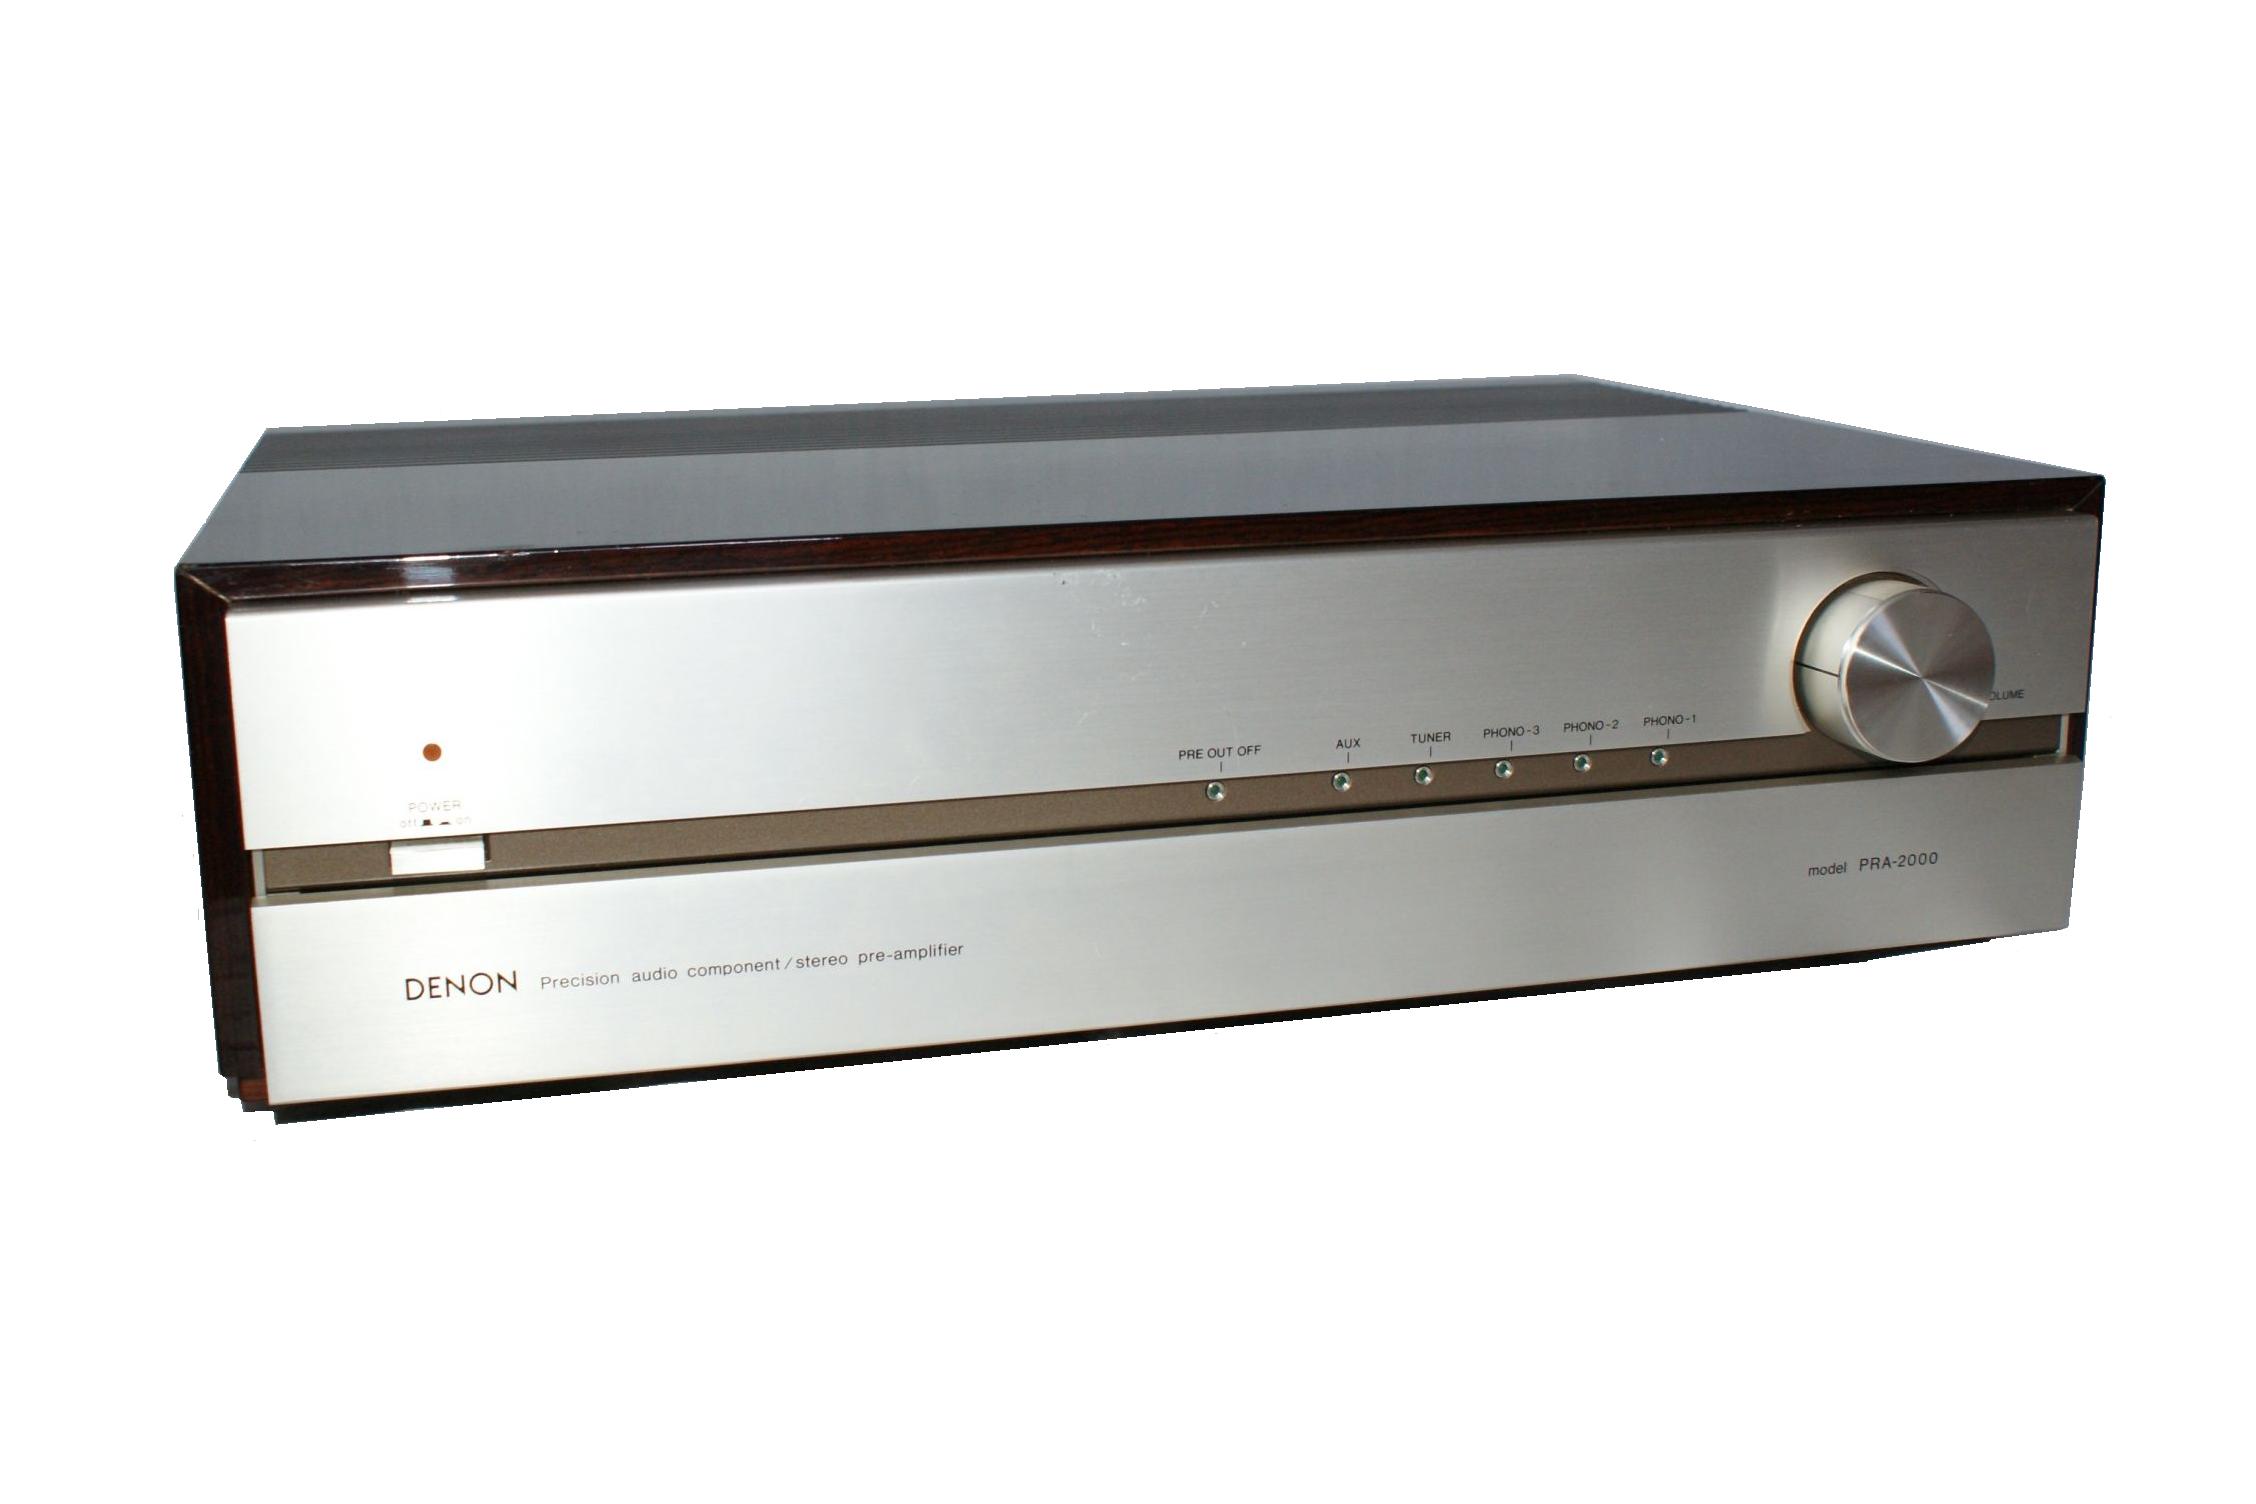 Усилитель Denon PRA-2000